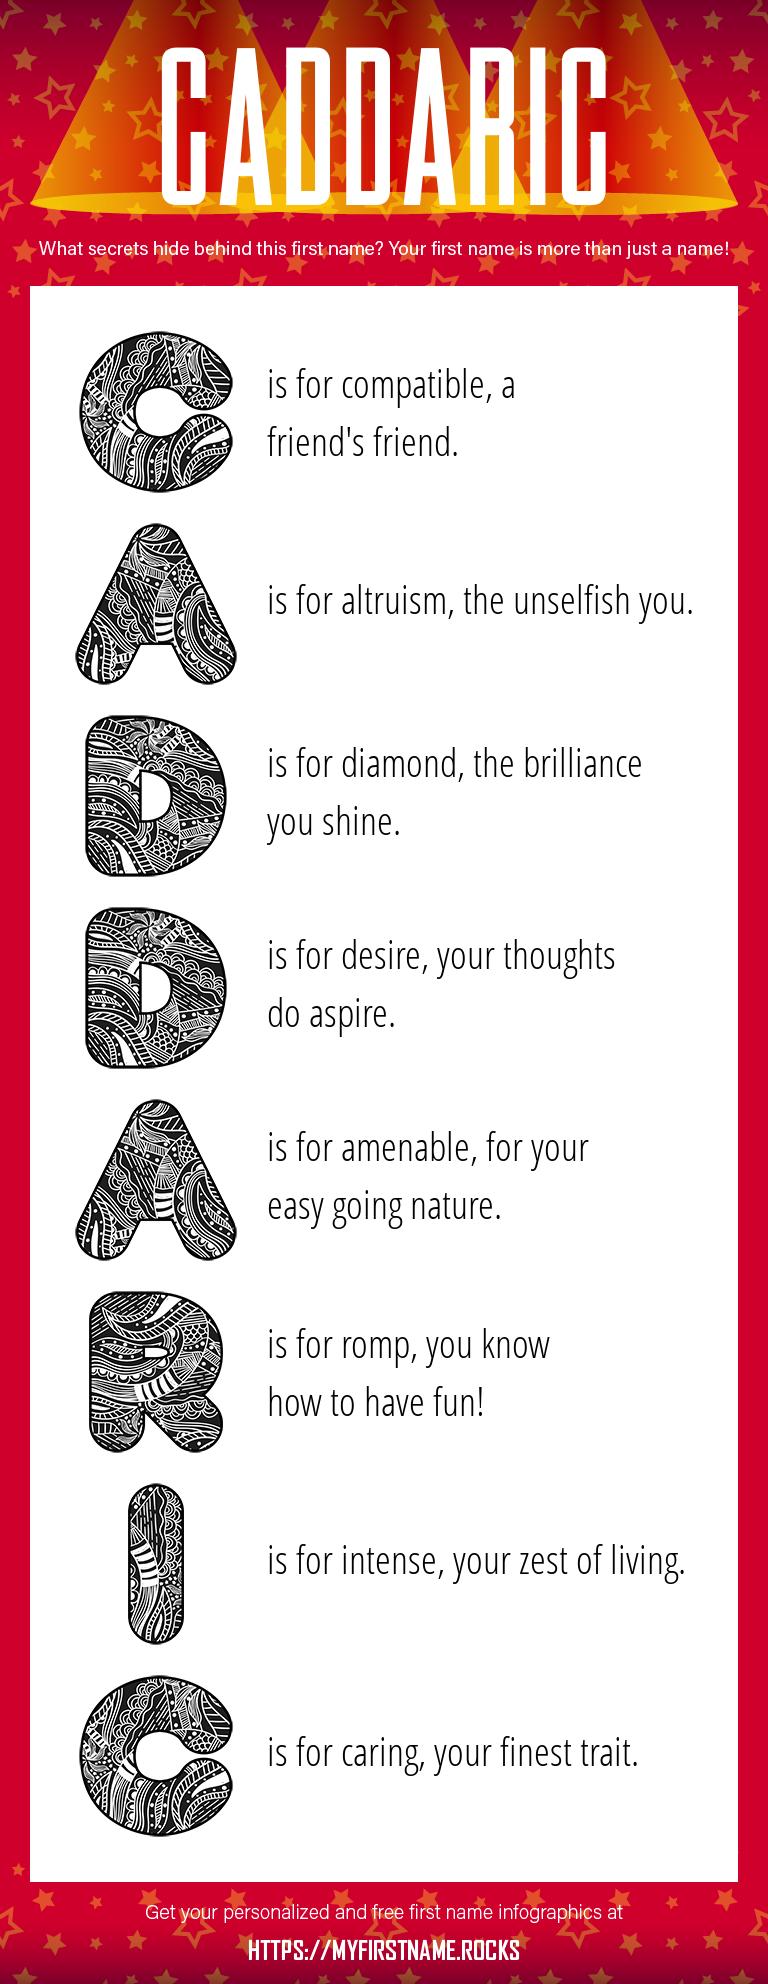 Caddaric Infographics